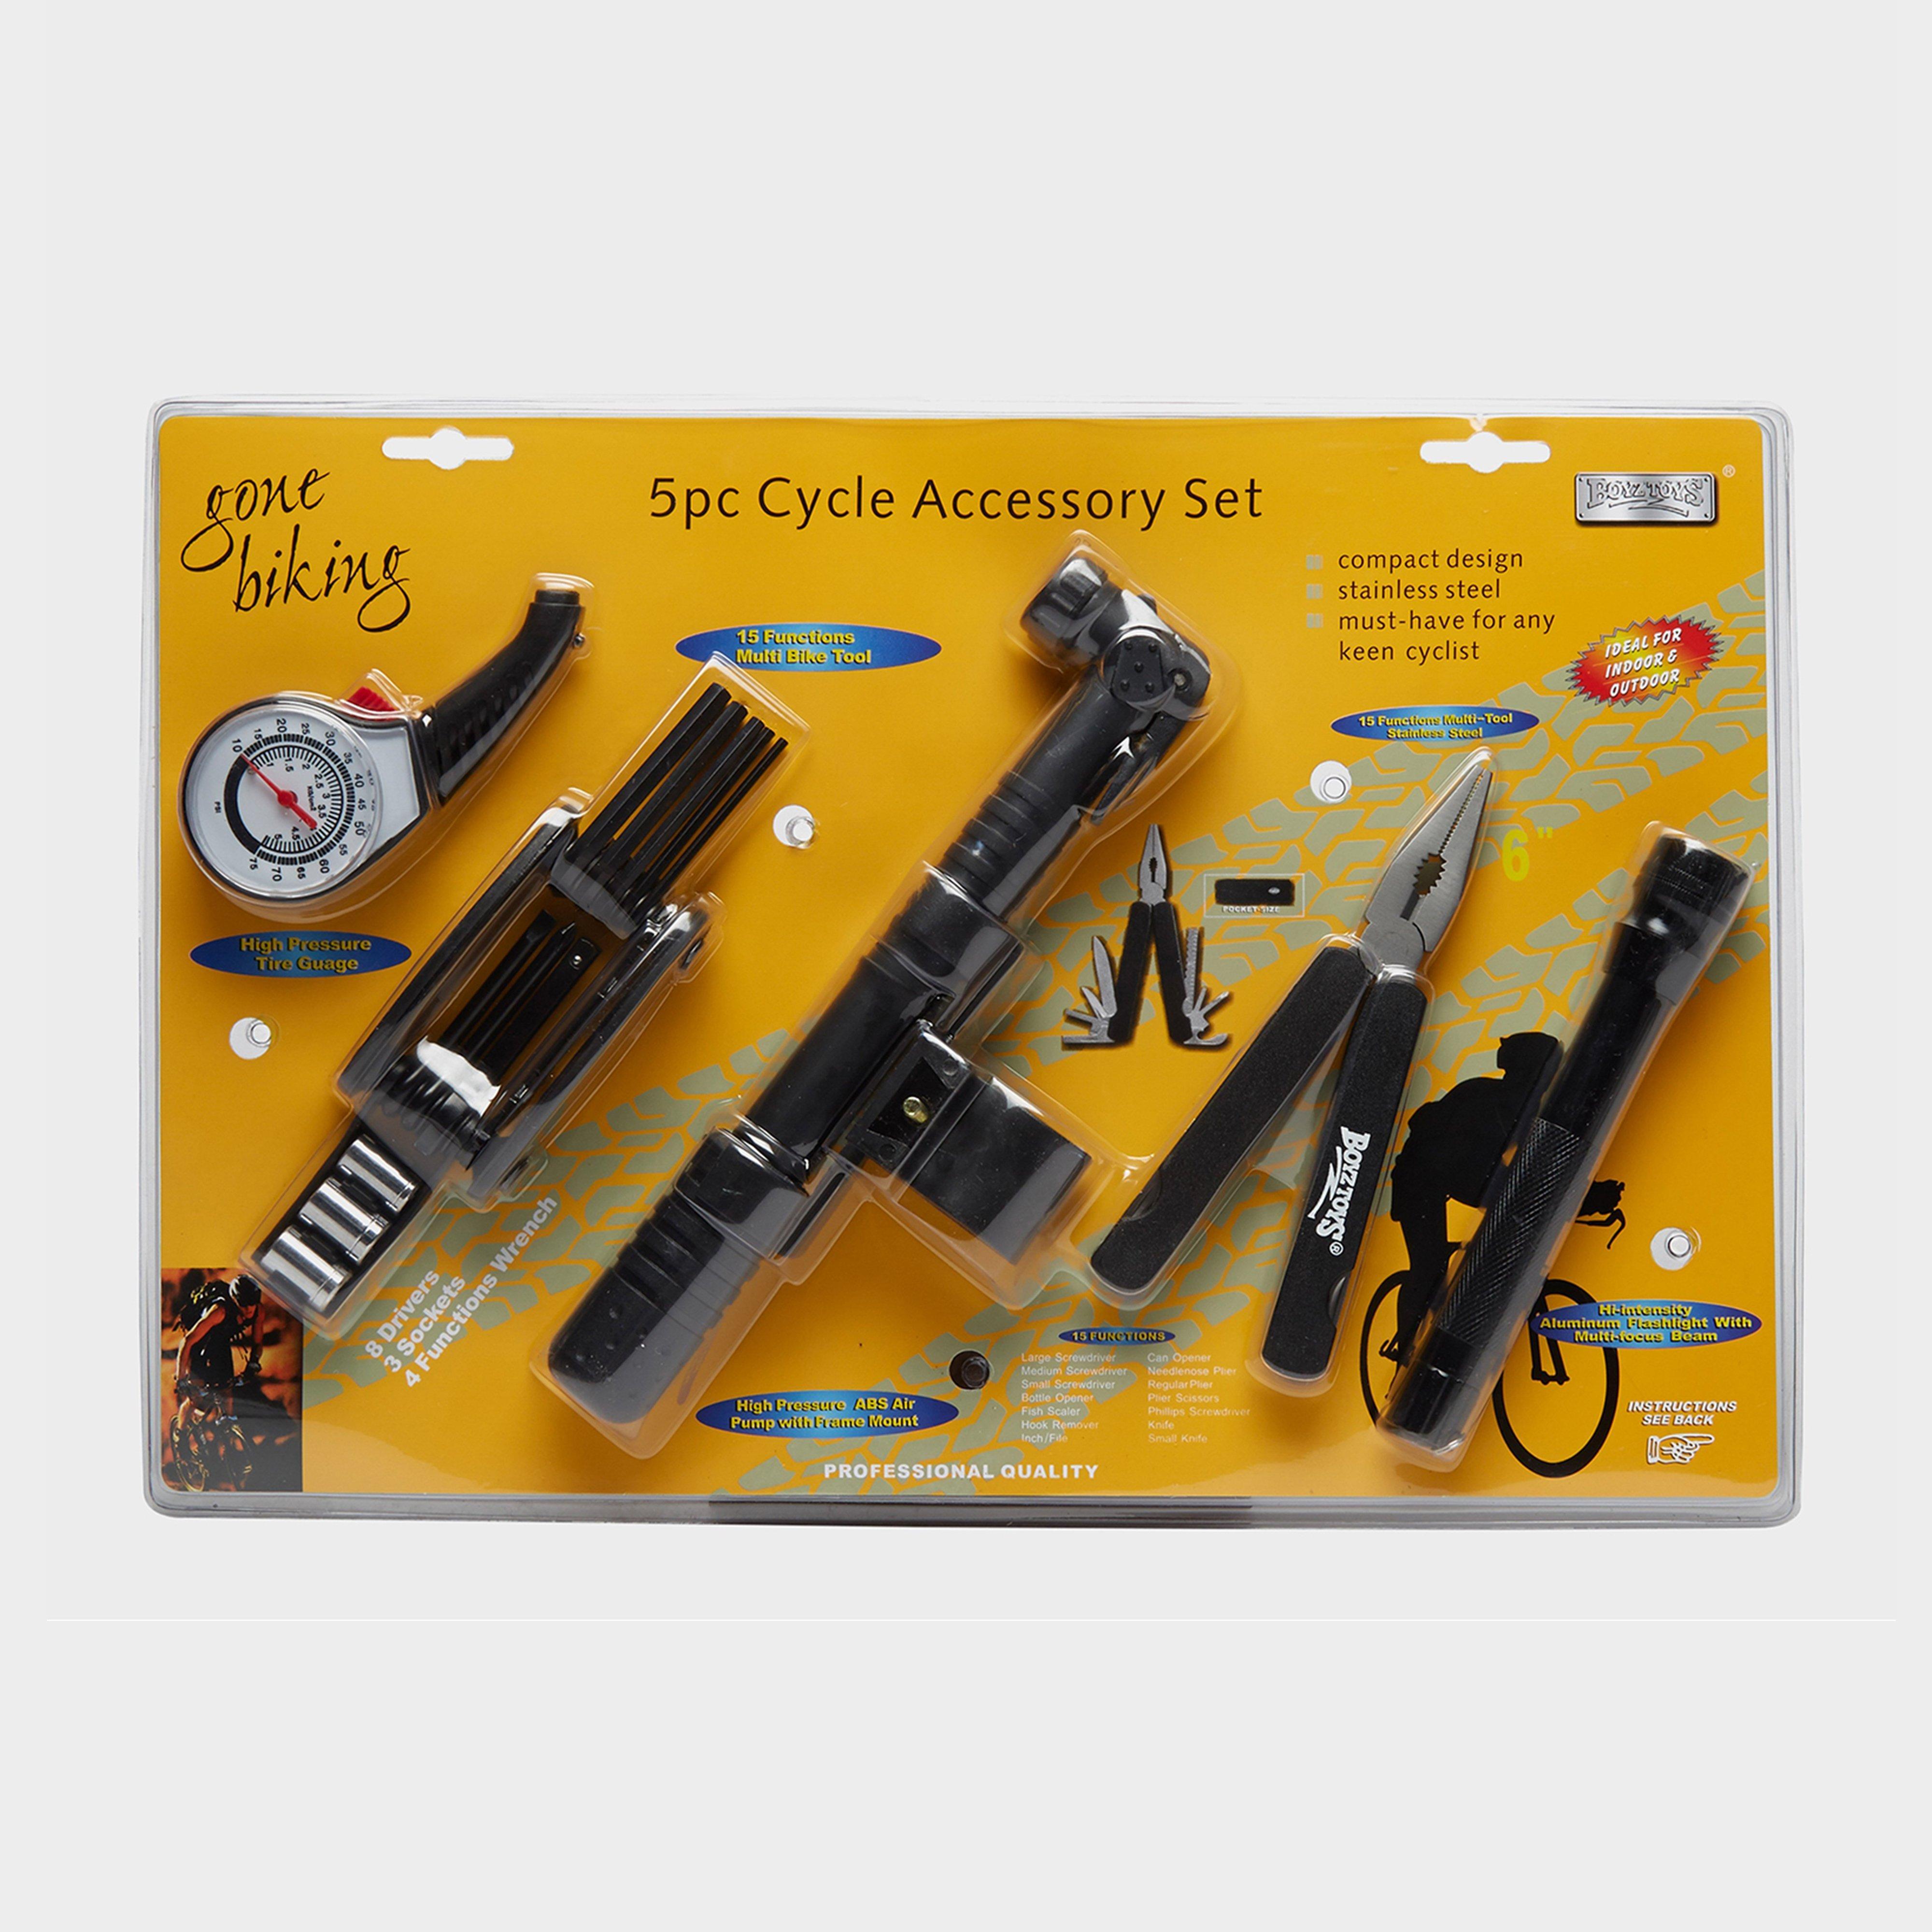 Boyz Toys 5 Piece Cycle Accessory Set - Black, Black